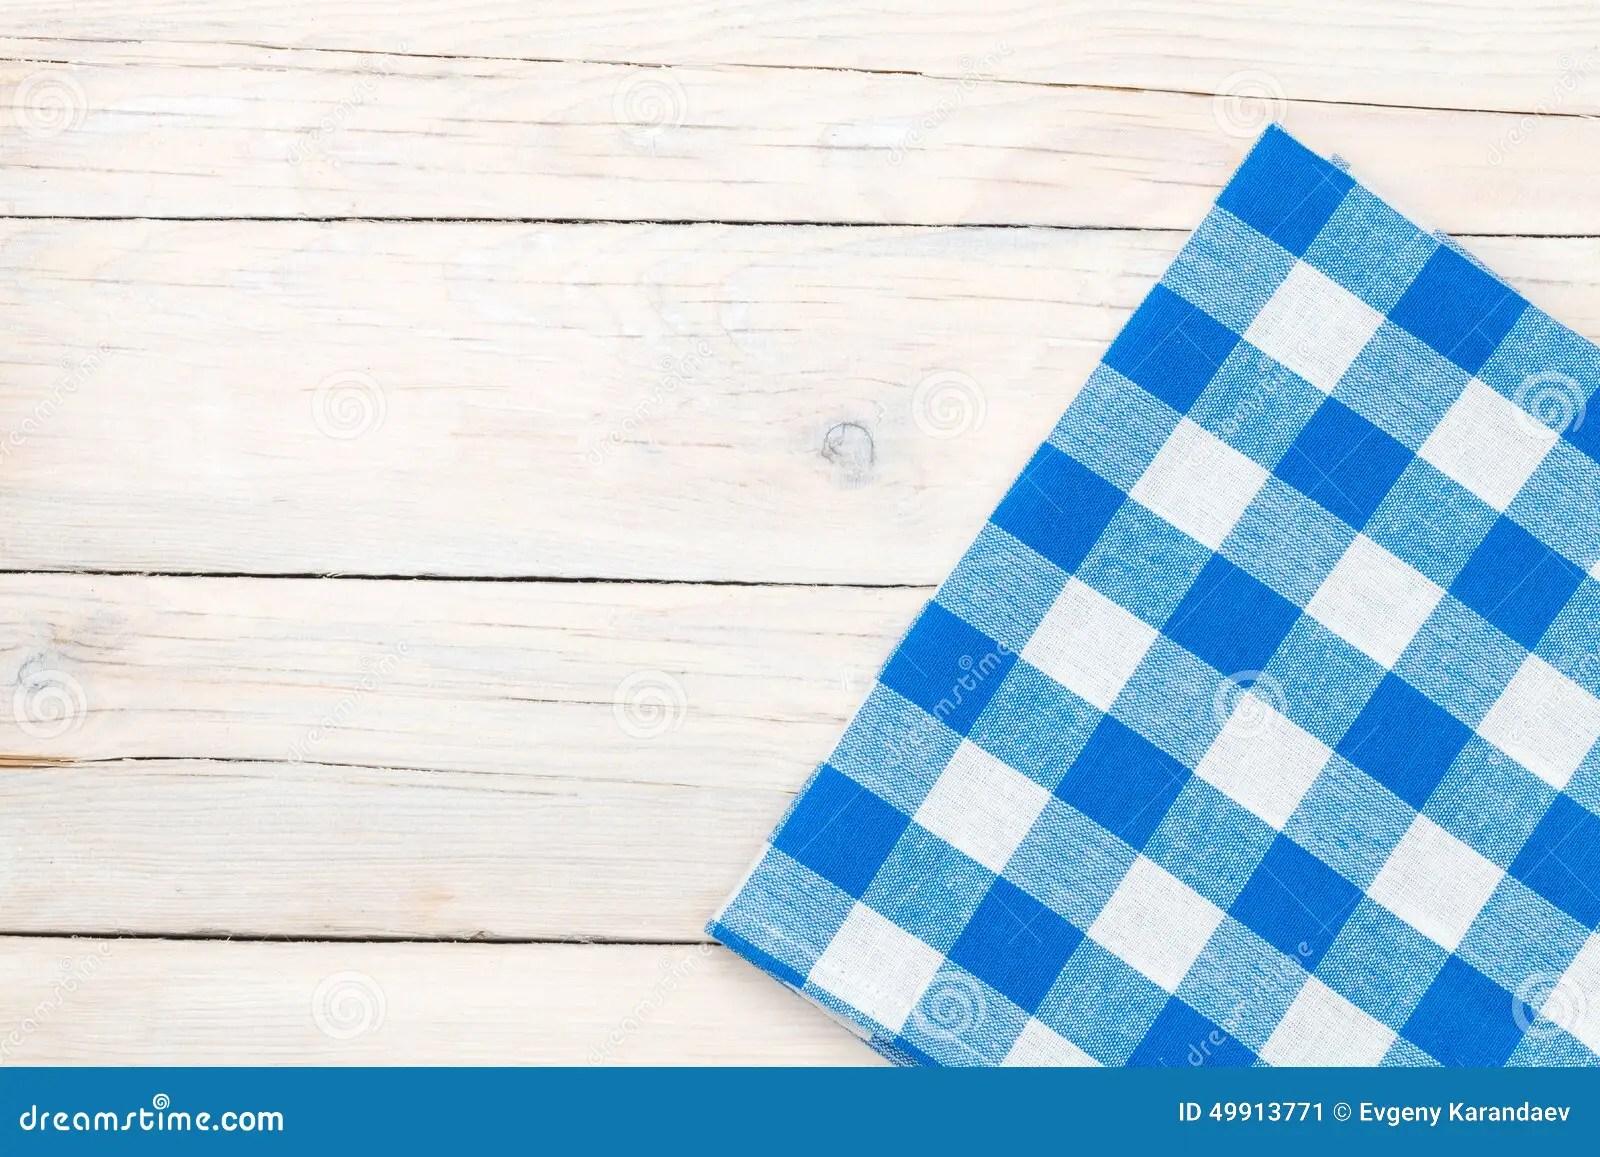 towel for kitchen samsung appliances 在木厨房用桌的蓝色毛巾库存图片 图片包括有表面 没人 检查 模式 在木厨房用桌的蓝色毛巾